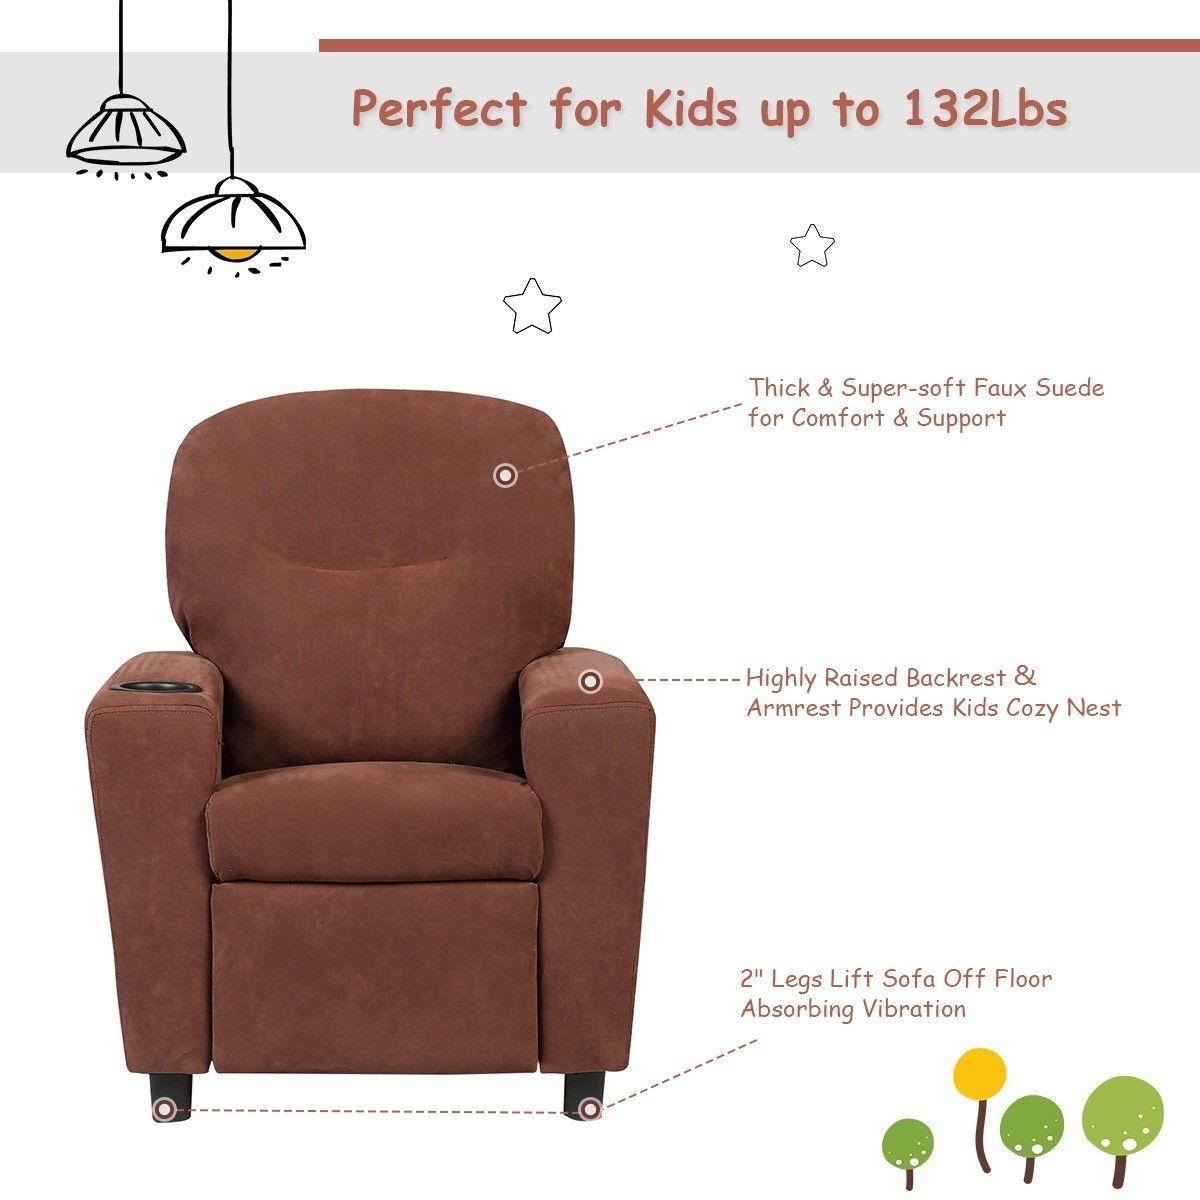 BL/BN Kids Recliner Arm chair